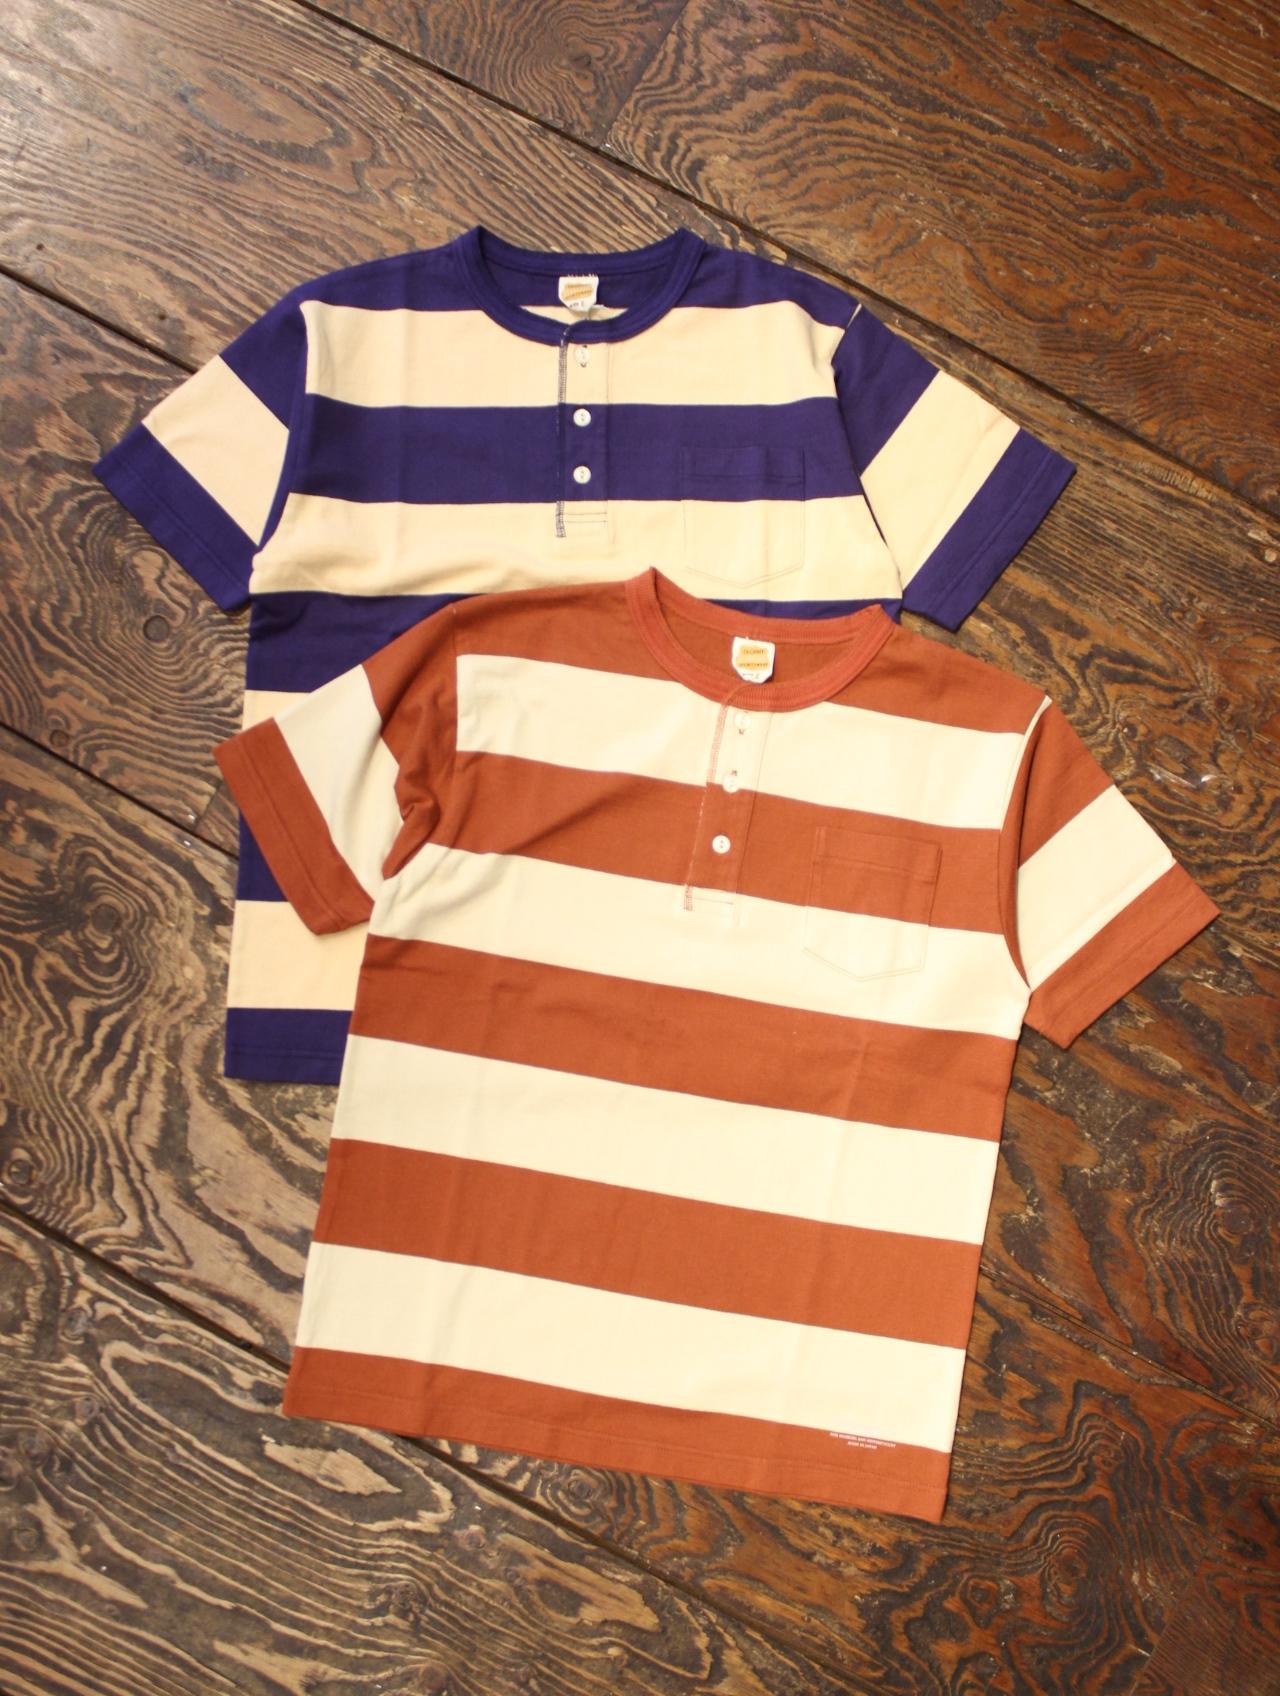 TROPHY CLOTHING  「Wide Border Henley Tee」 ボーダーヘンリーネックティーシャツ